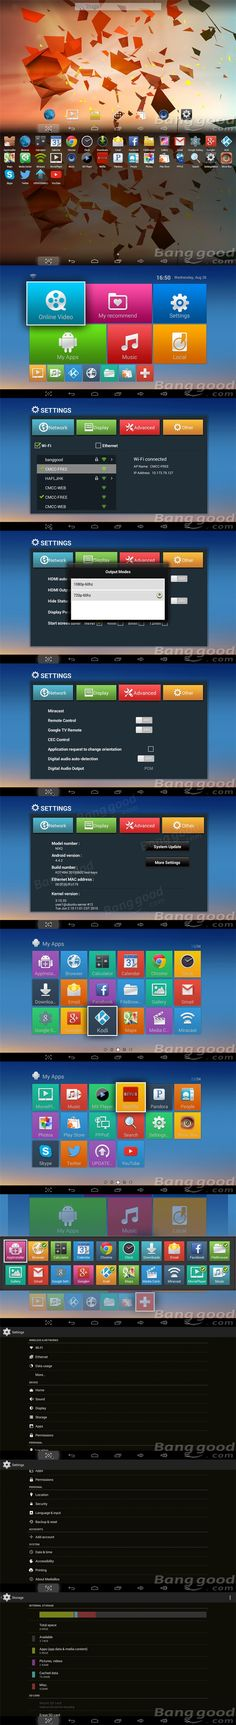 MXQ S805 1GB/8GB Fully loaded KODI 14.2 Quad Core Android 4.4 1080P HD H.265 HEVC TV Box Android Mini PC Sale-Banggood.com Electronic Toys, Photography Camera, Android 4, Arduino, Quad, Core, Smartphone, Technology, Mini